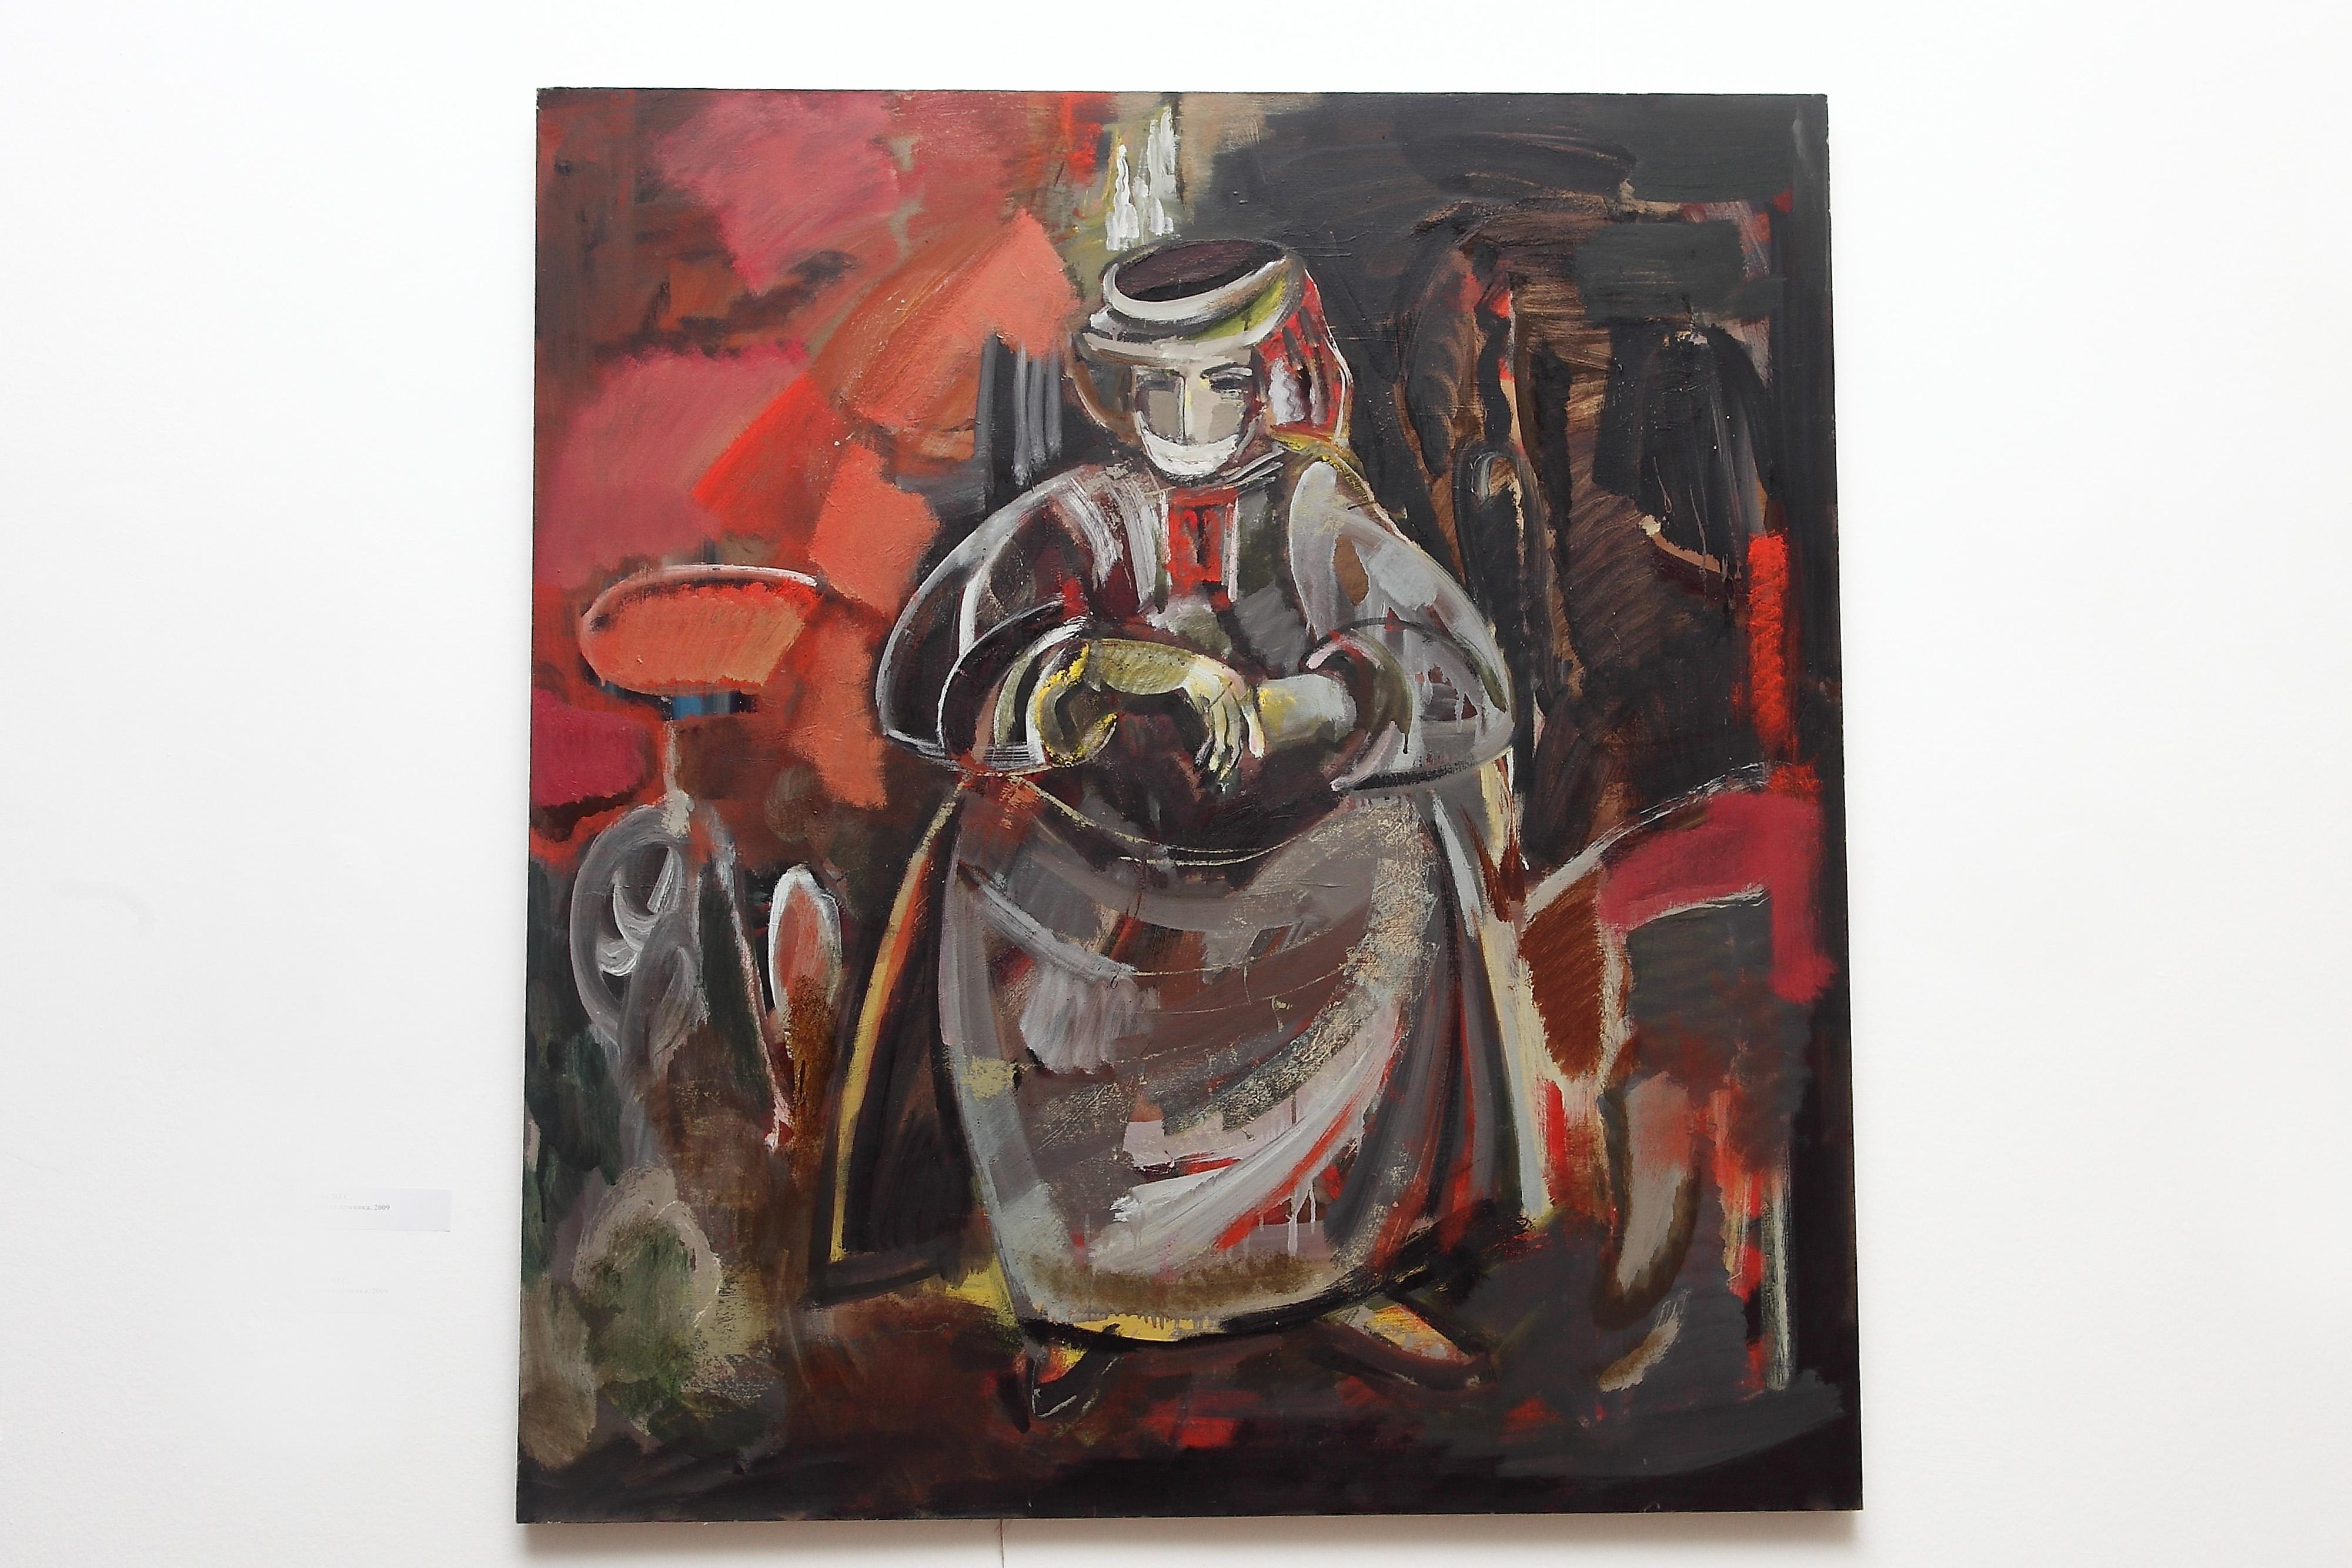 армянка 130х120 х.м. 2009 - An Armenian Woman of Karabakh, 130x120, oil on canvas, 2009